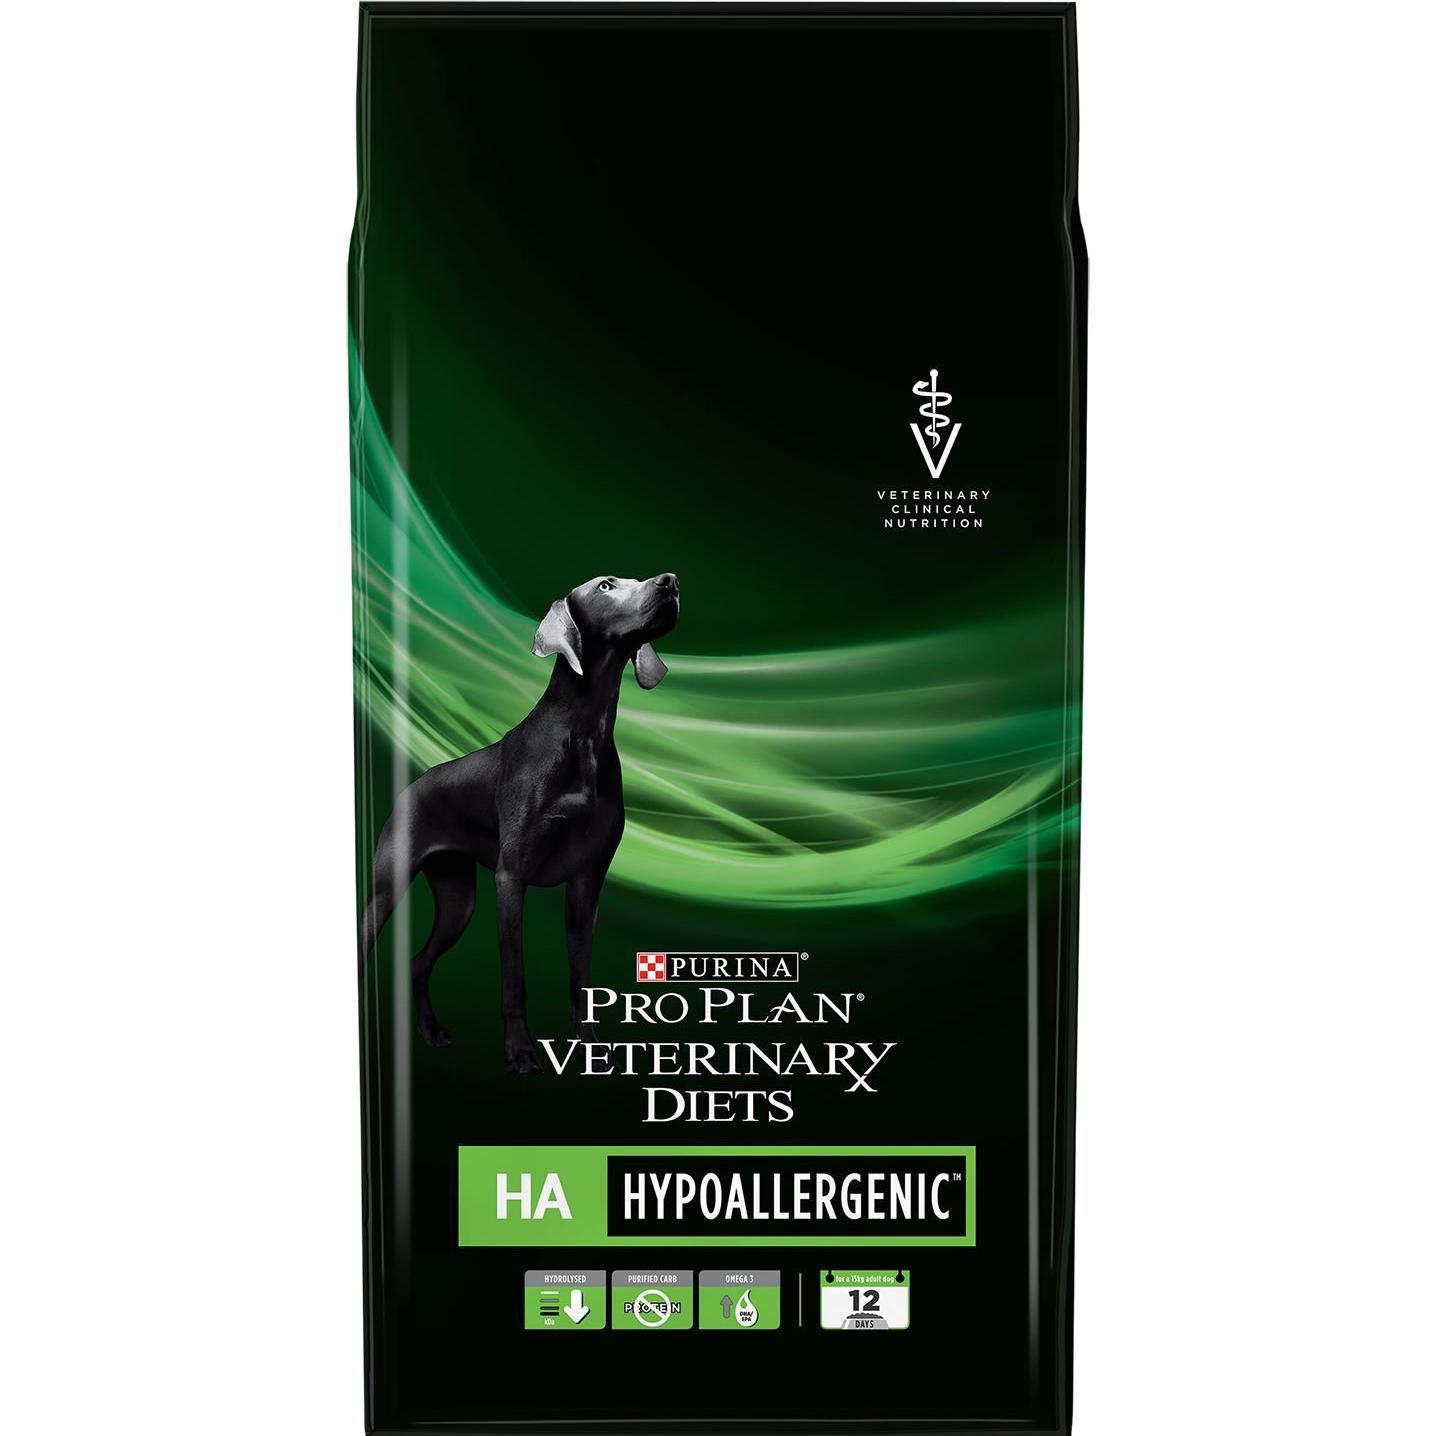 Корм для собак PRO PLAN Veterinary Diets HA Hypoallergenic При пищевой аллергии 3 кг